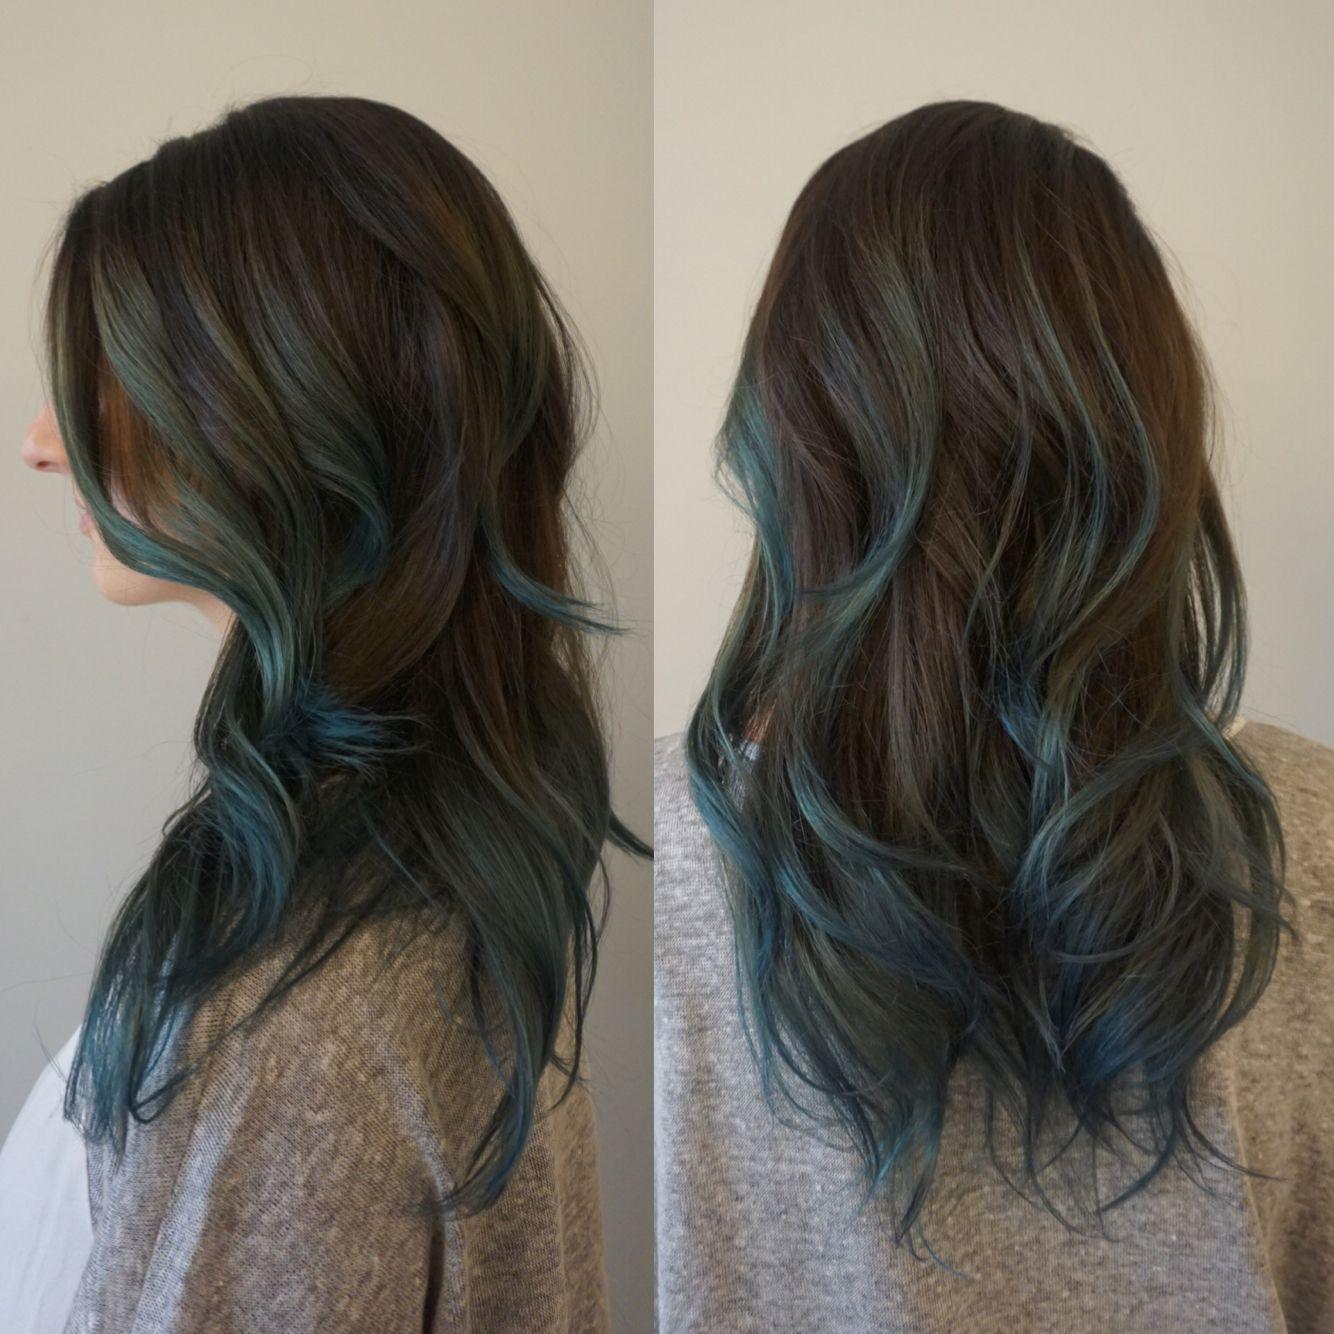 Dusty Blue Sombre Holly At Blueprint Modern Hair In Portland Or Instagram Hollylikeshair Hair Highlights Long Hair Styles Hair Styles